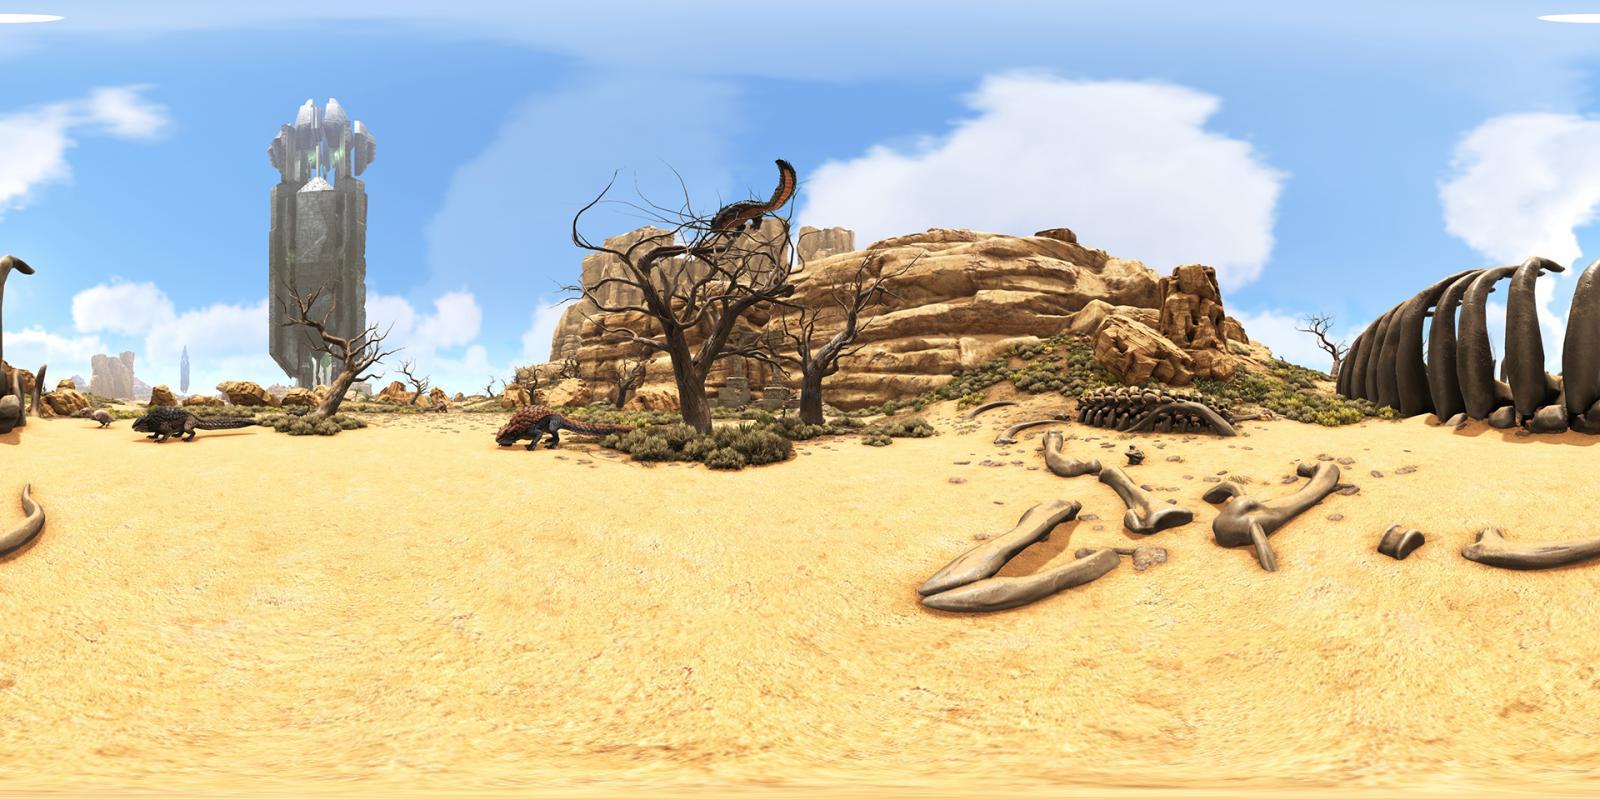 large.58a7b0b4962ad_FataL1ty-Plane-Panoramic360Stereoscopic3D.jpg